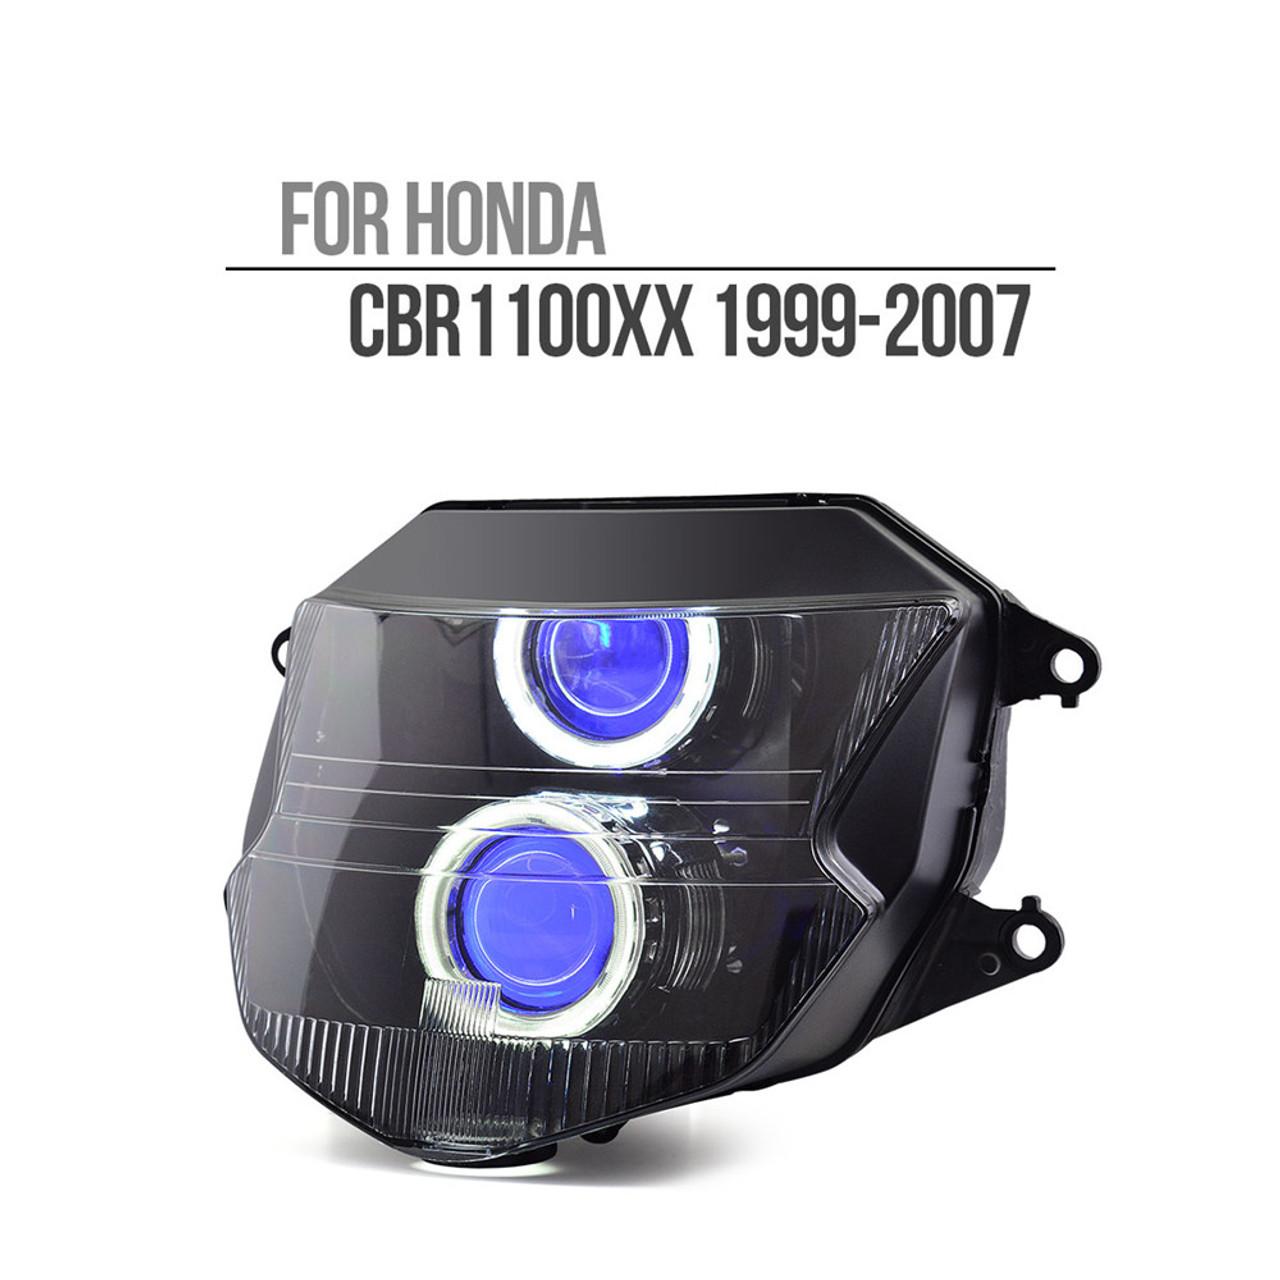 Honda CBR1100XX Headlight 1999 2000 2001 2002 2003 2004 2005 2006 2007